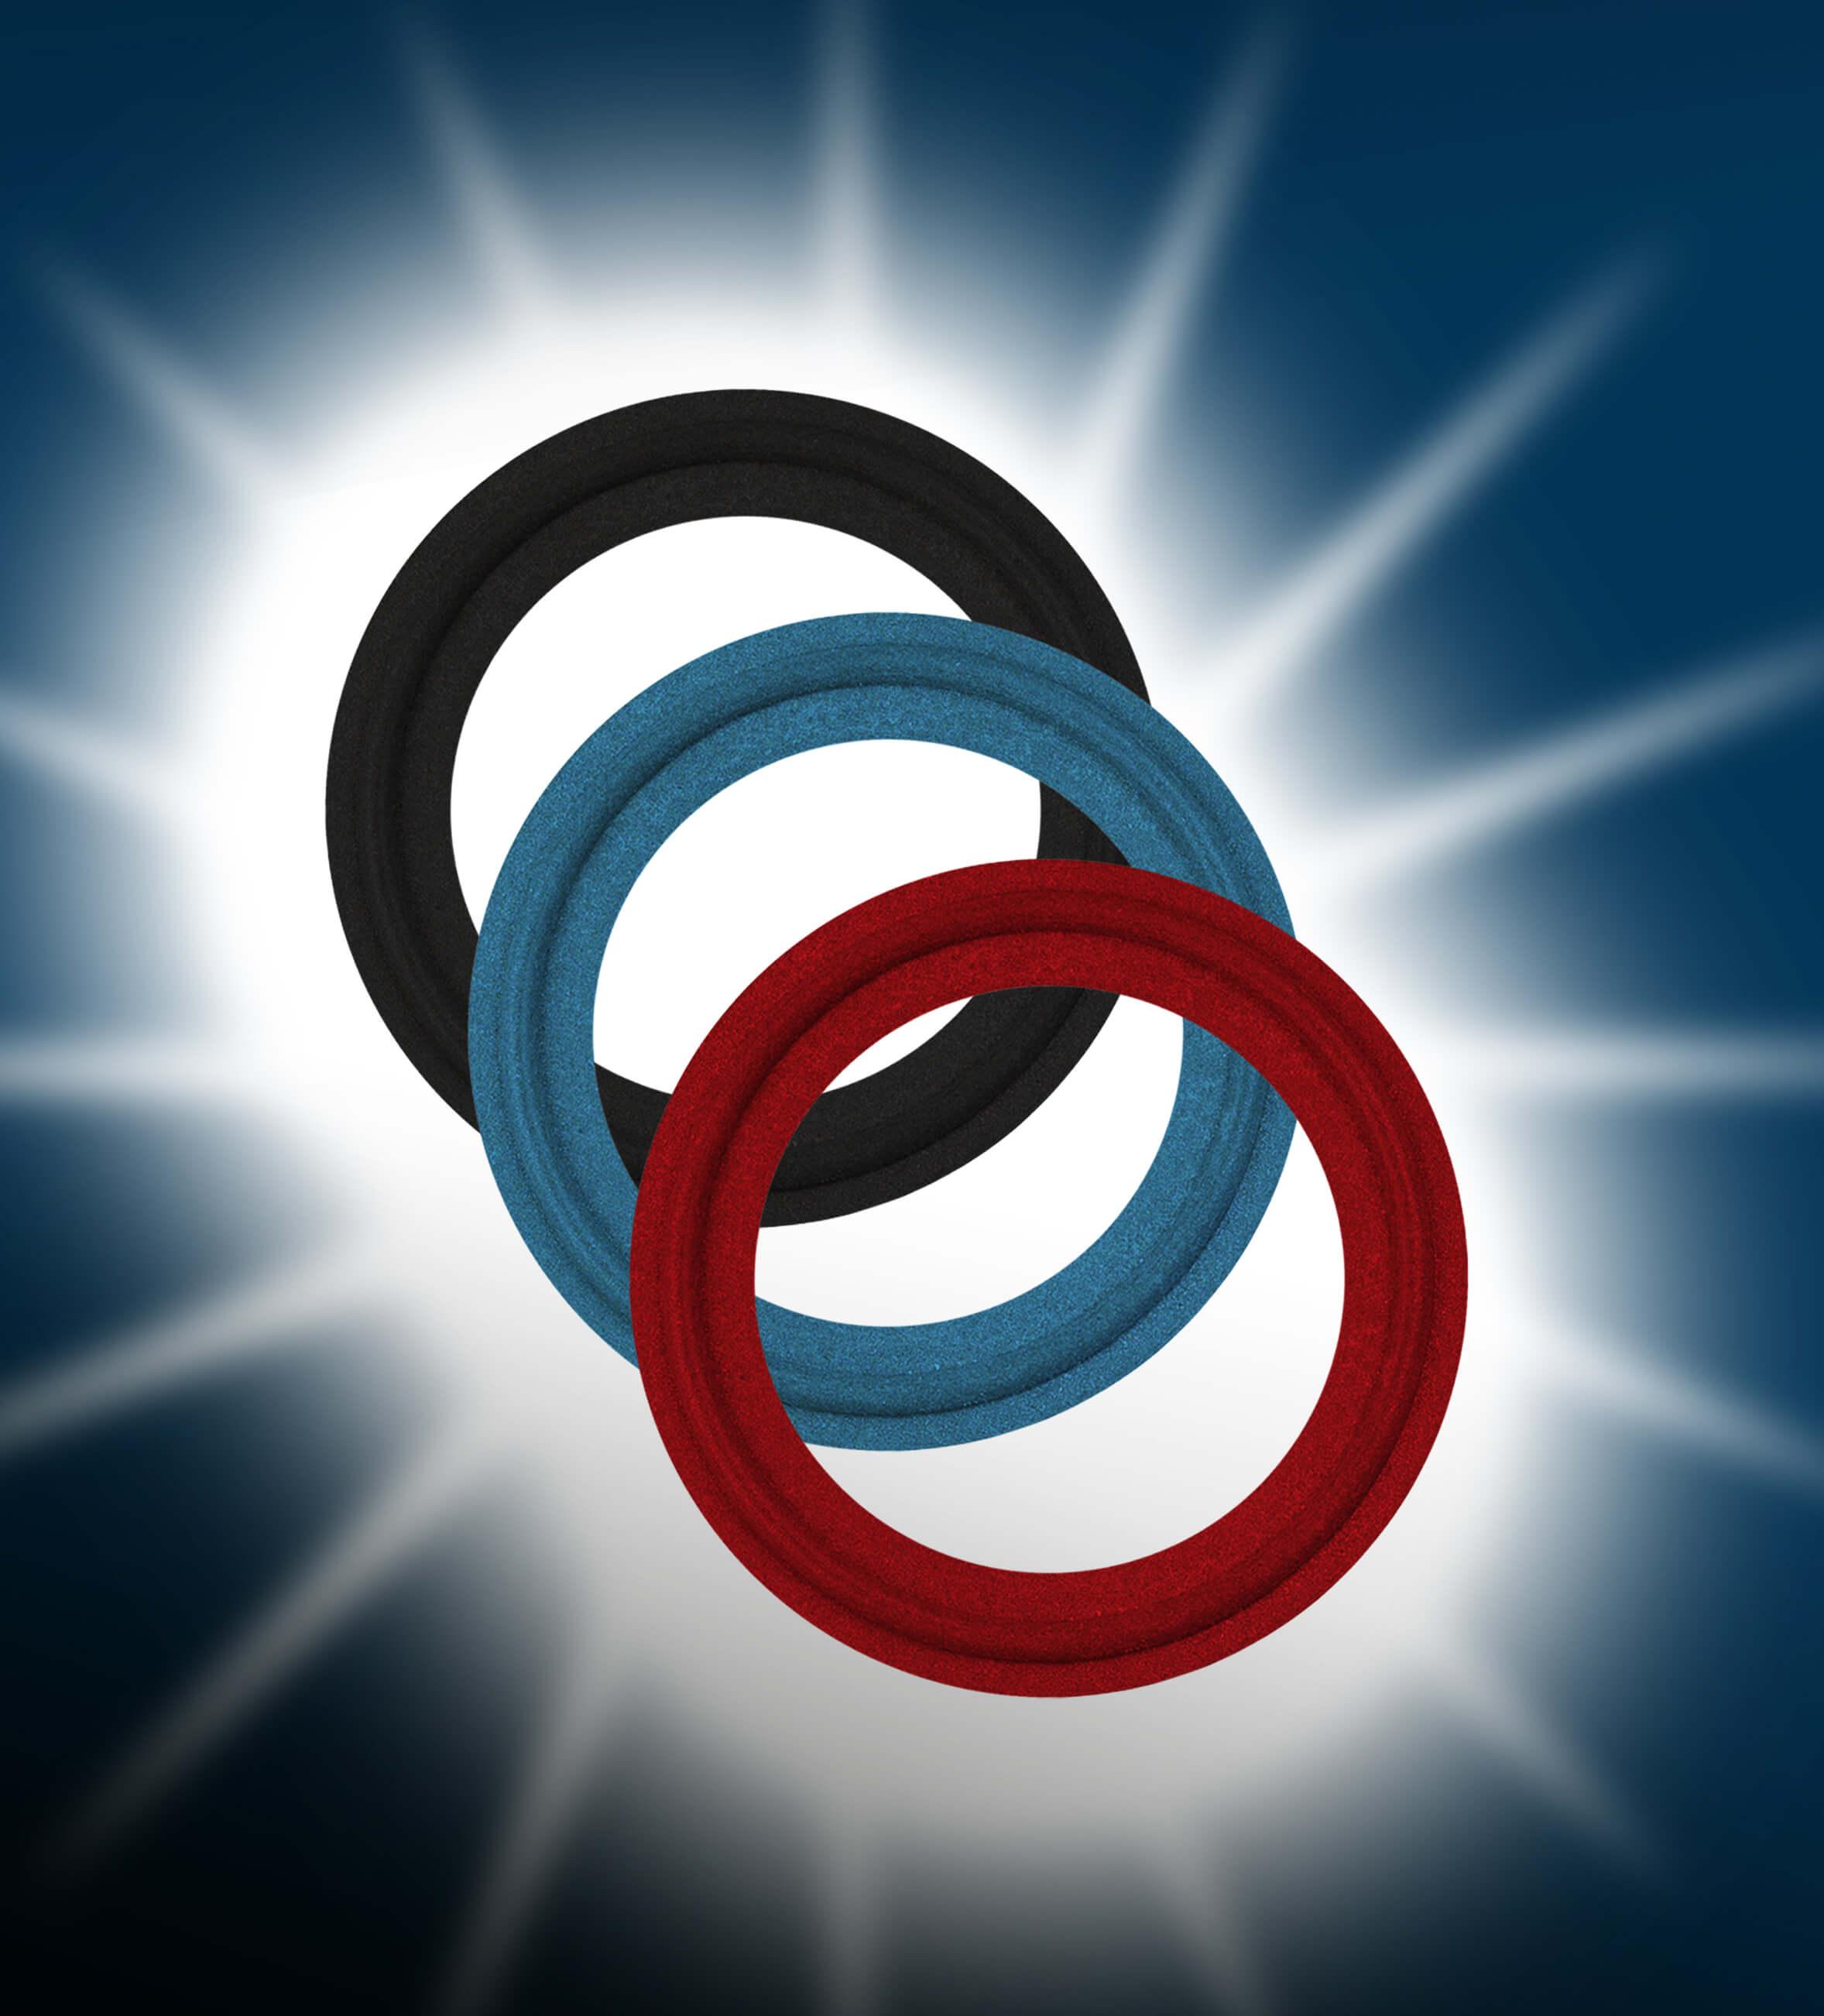 Encapsulated O Ring